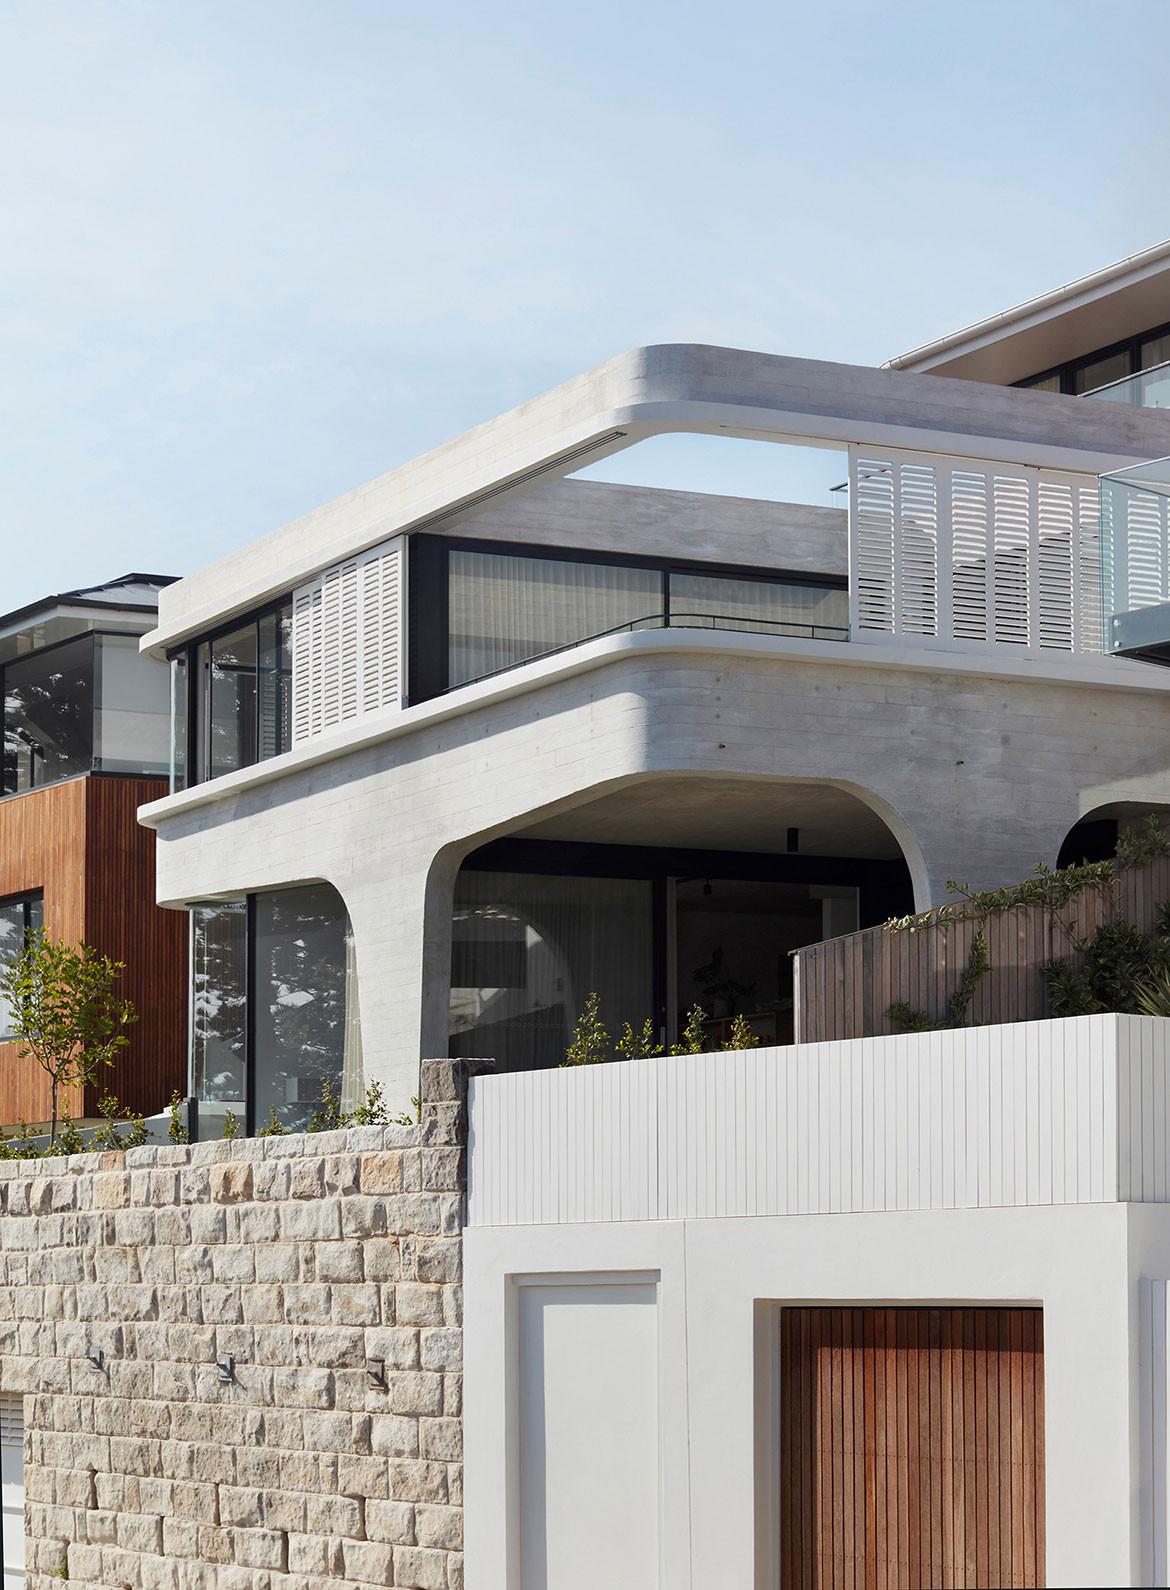 Tamas Tee House Luigi Rosselli Architects streetview